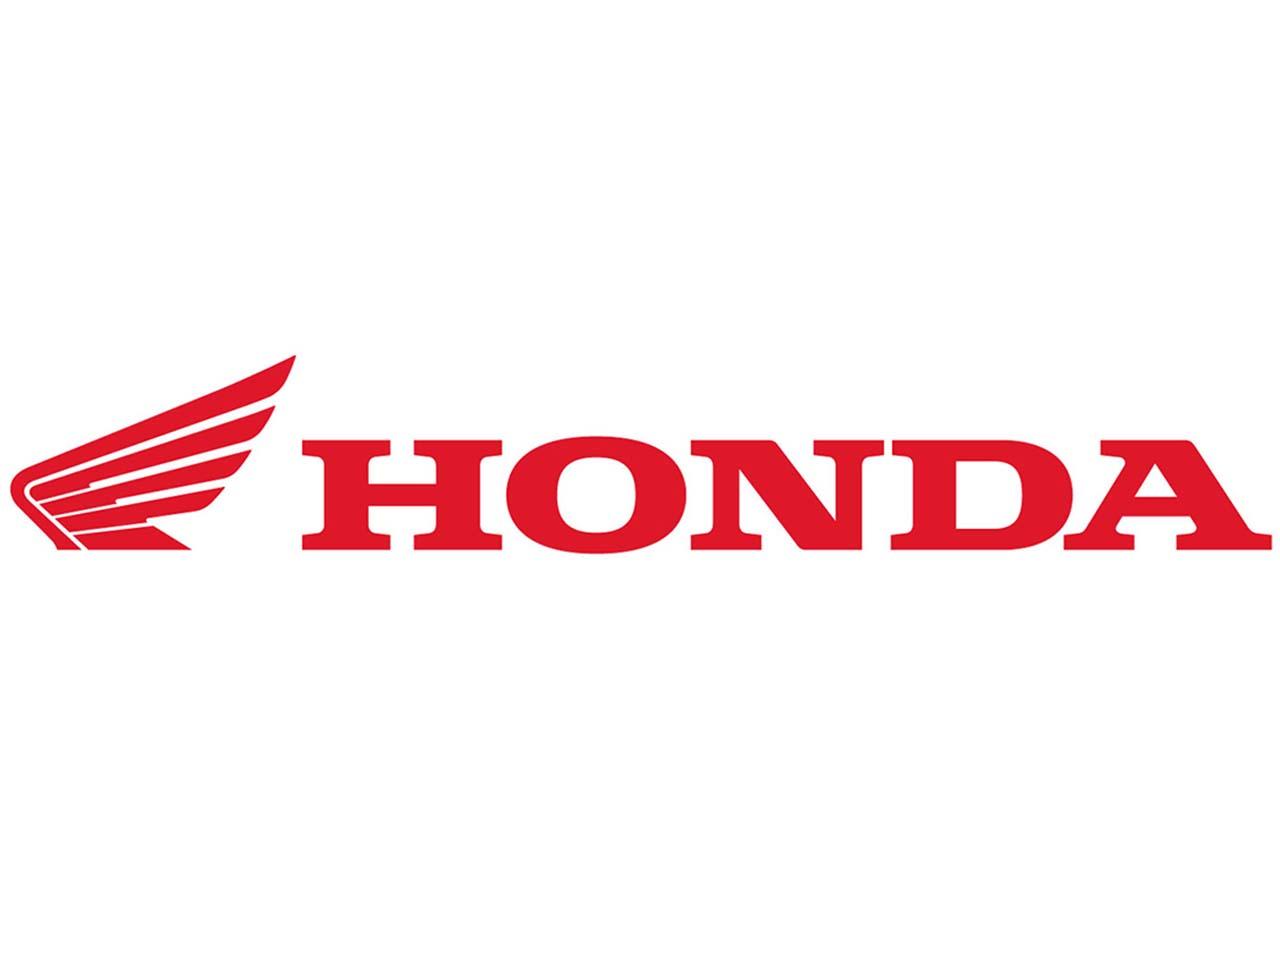 Honda Motorcycles Logo Vector 2016 Honda Motorcycles Logo Vector - Honda Logo Vector PNG